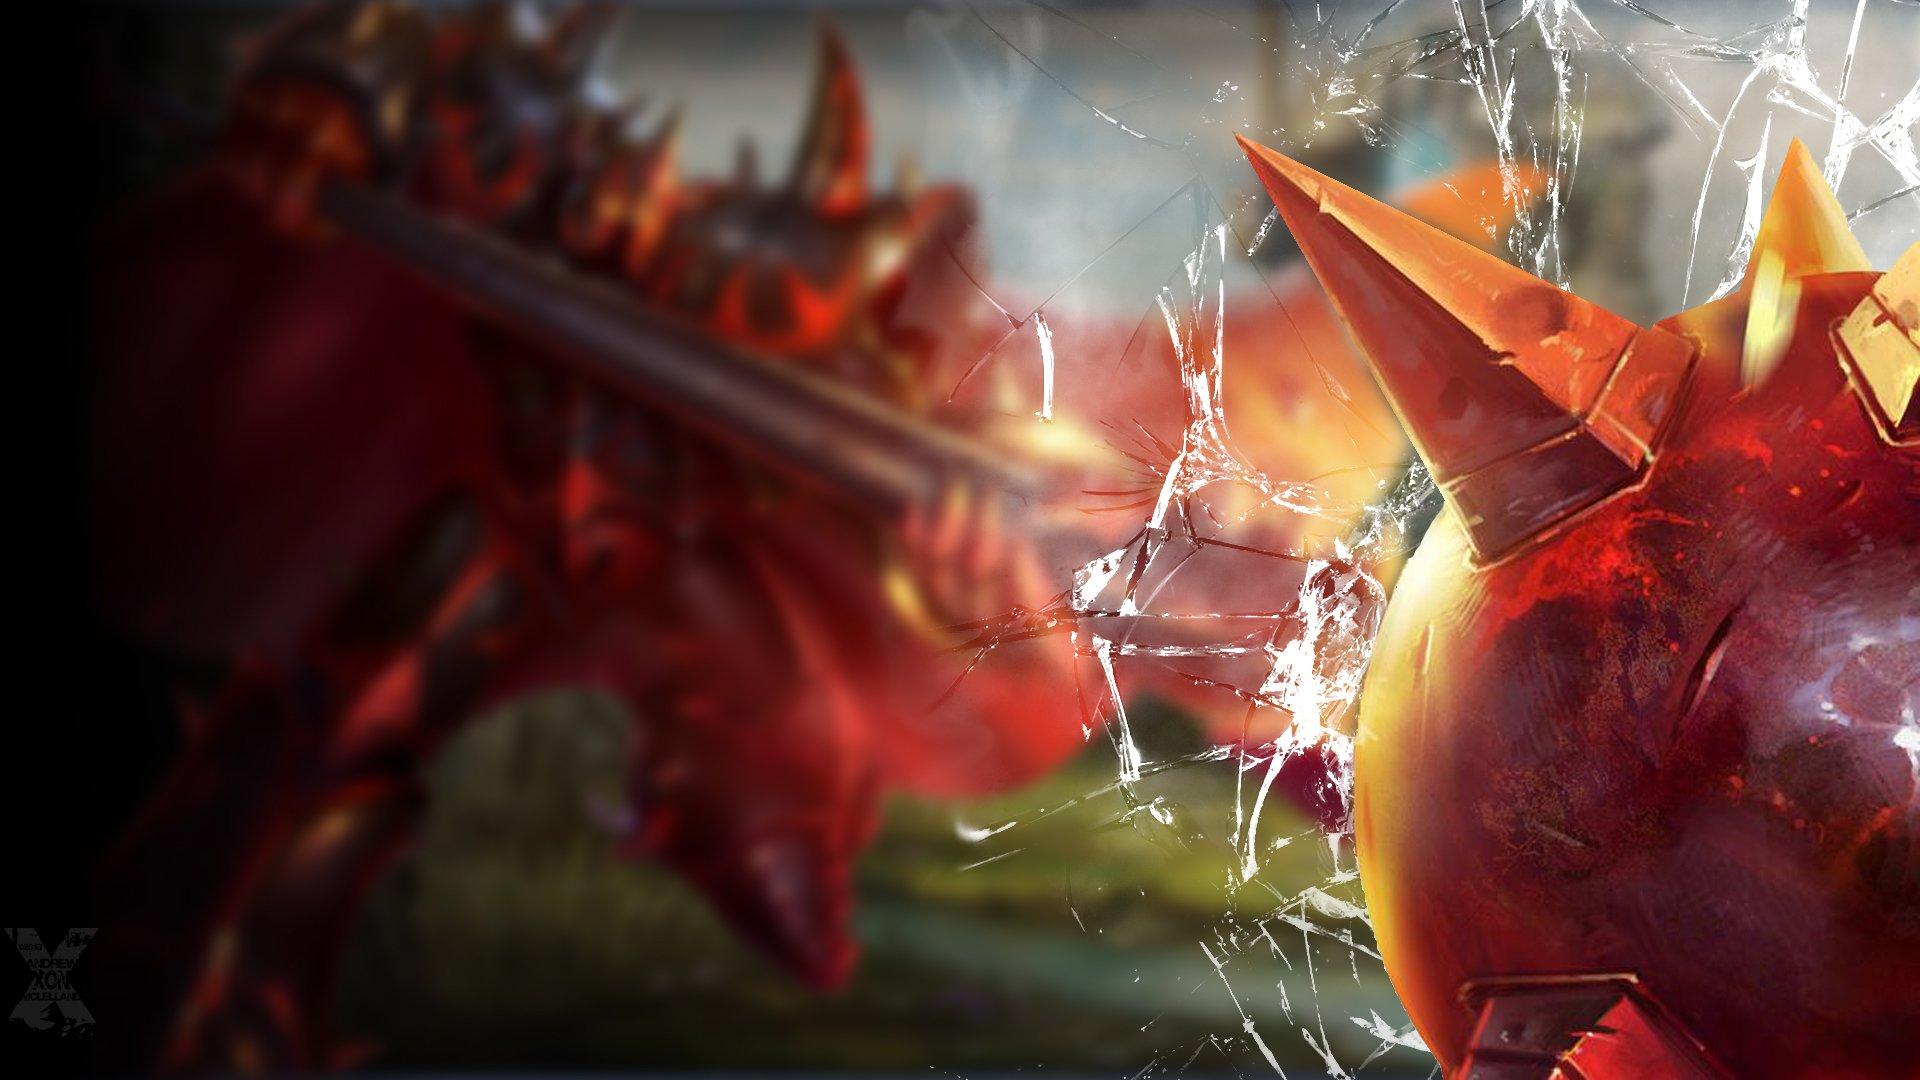 Video Game - League Of Legends  Mordekaiser (League Of Legends) Wallpaper